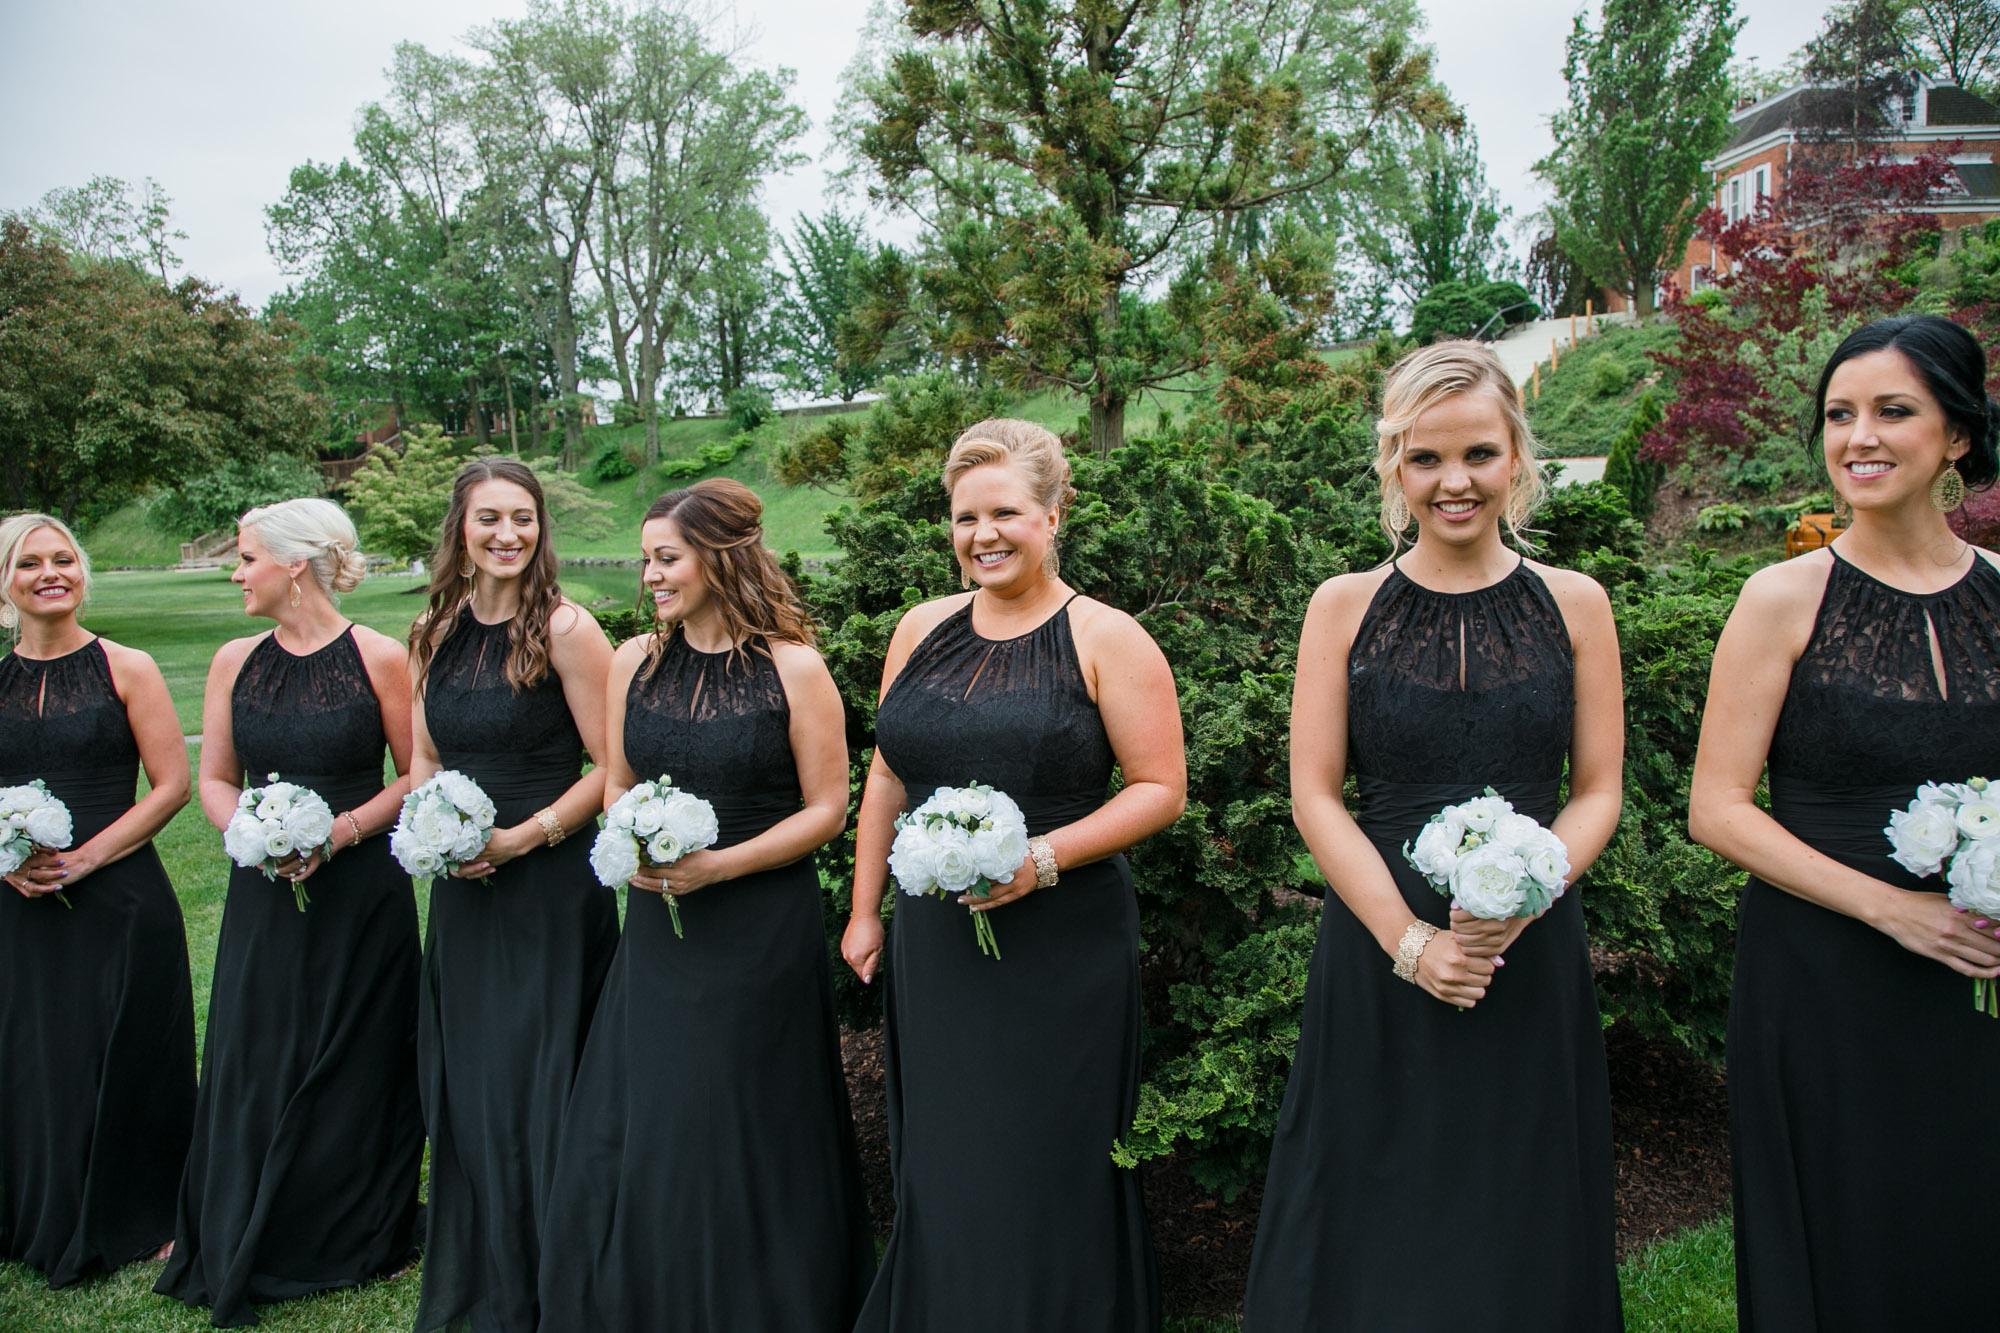 hensville-wedding-downtown-toledo-ohio (44 of 103).jpg